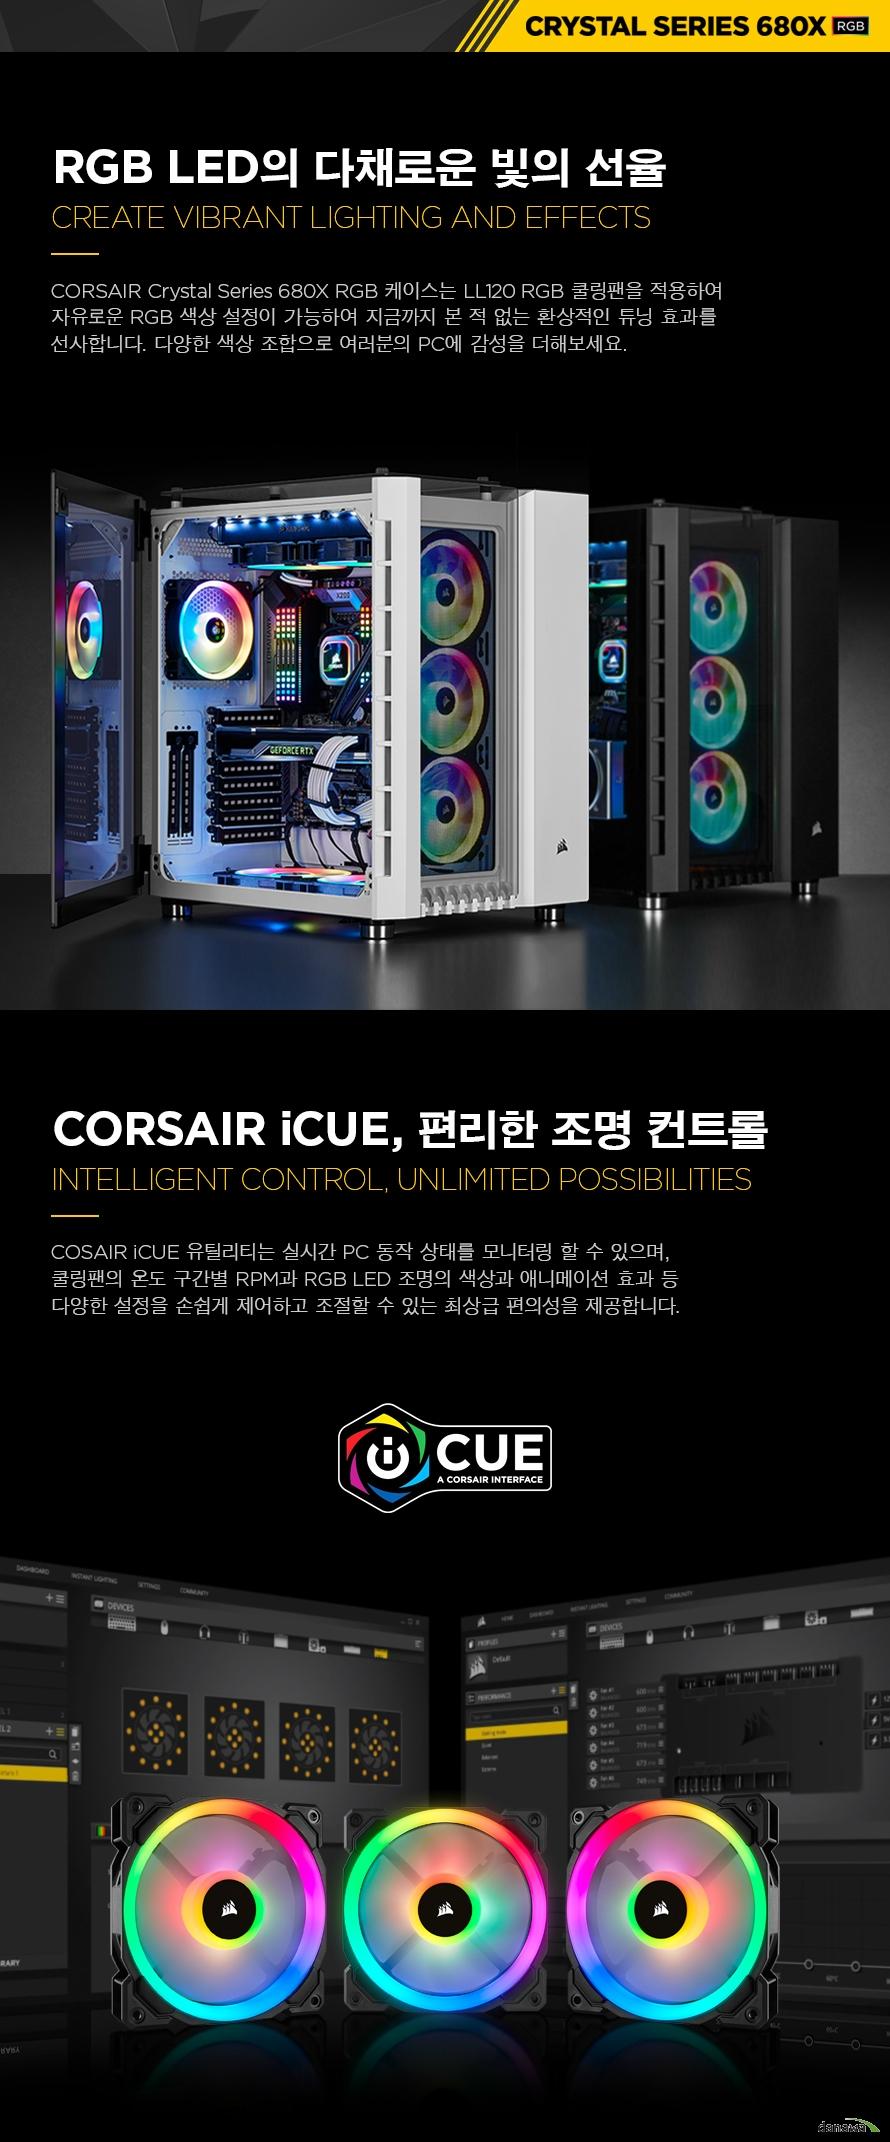 CORSAIR CRYSTAL SERIES 680X RGB(화이트)